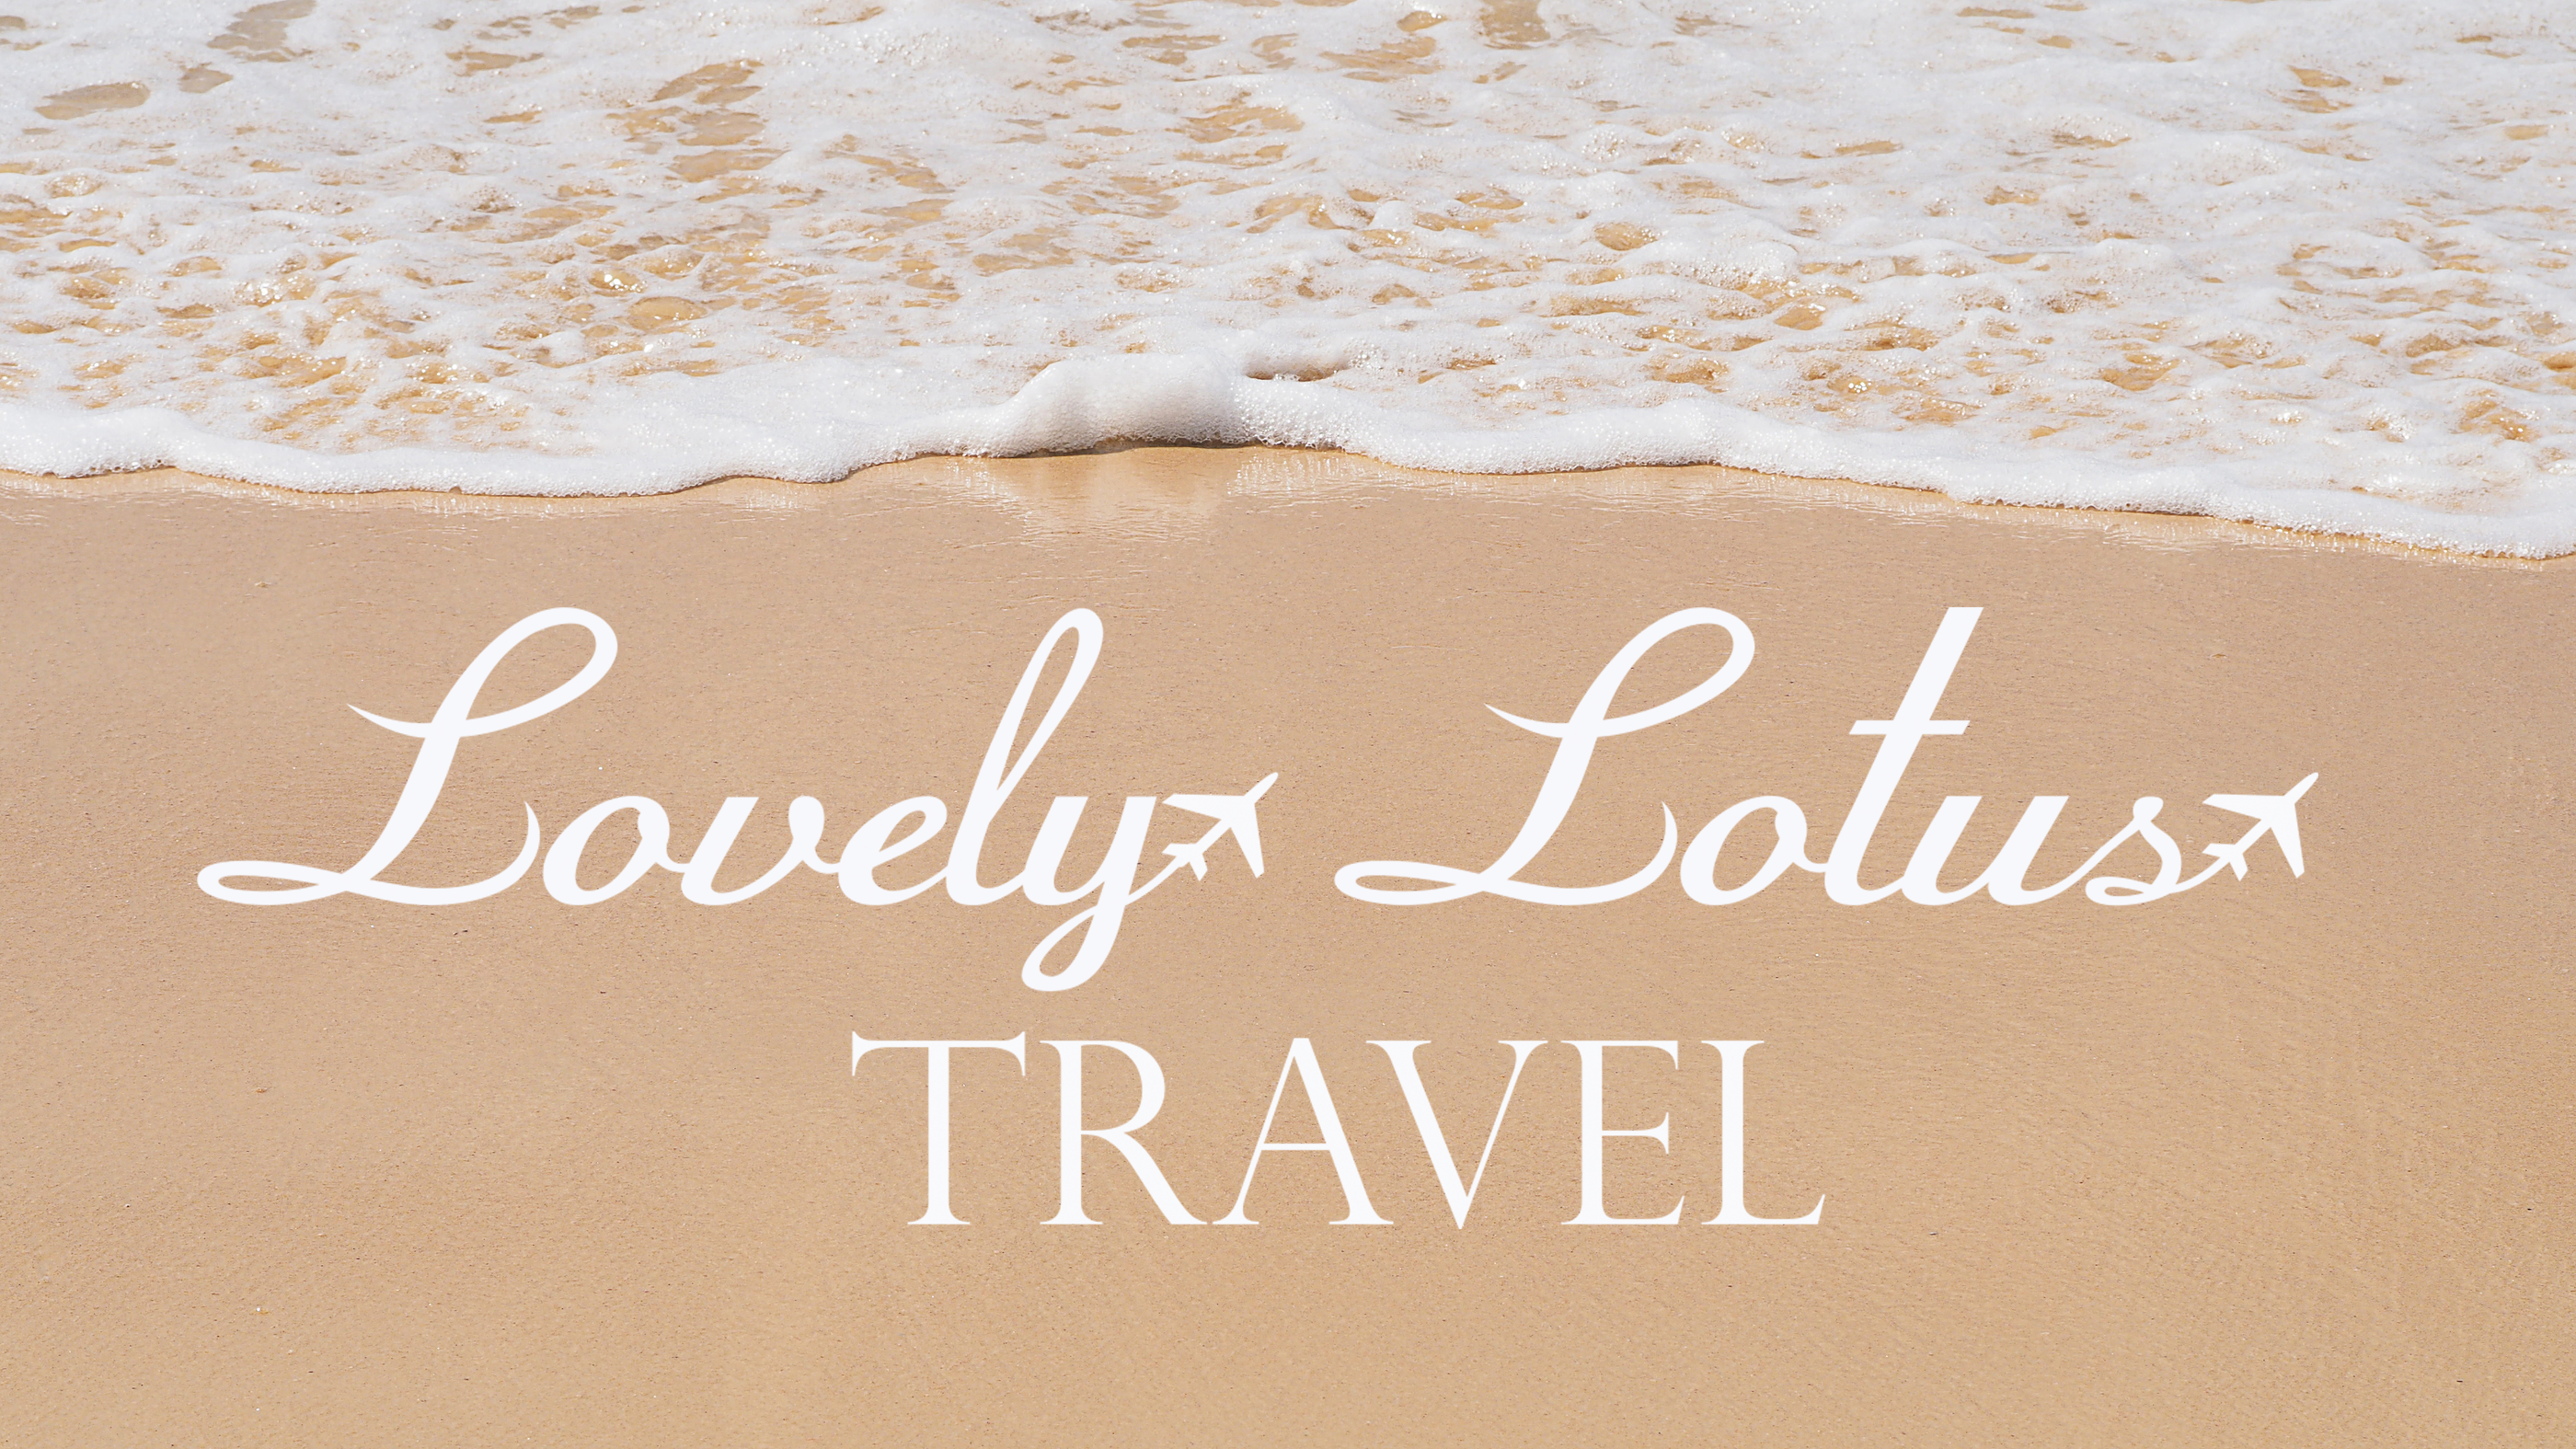 Lovely Lotus Travel   Honeymoon Fund